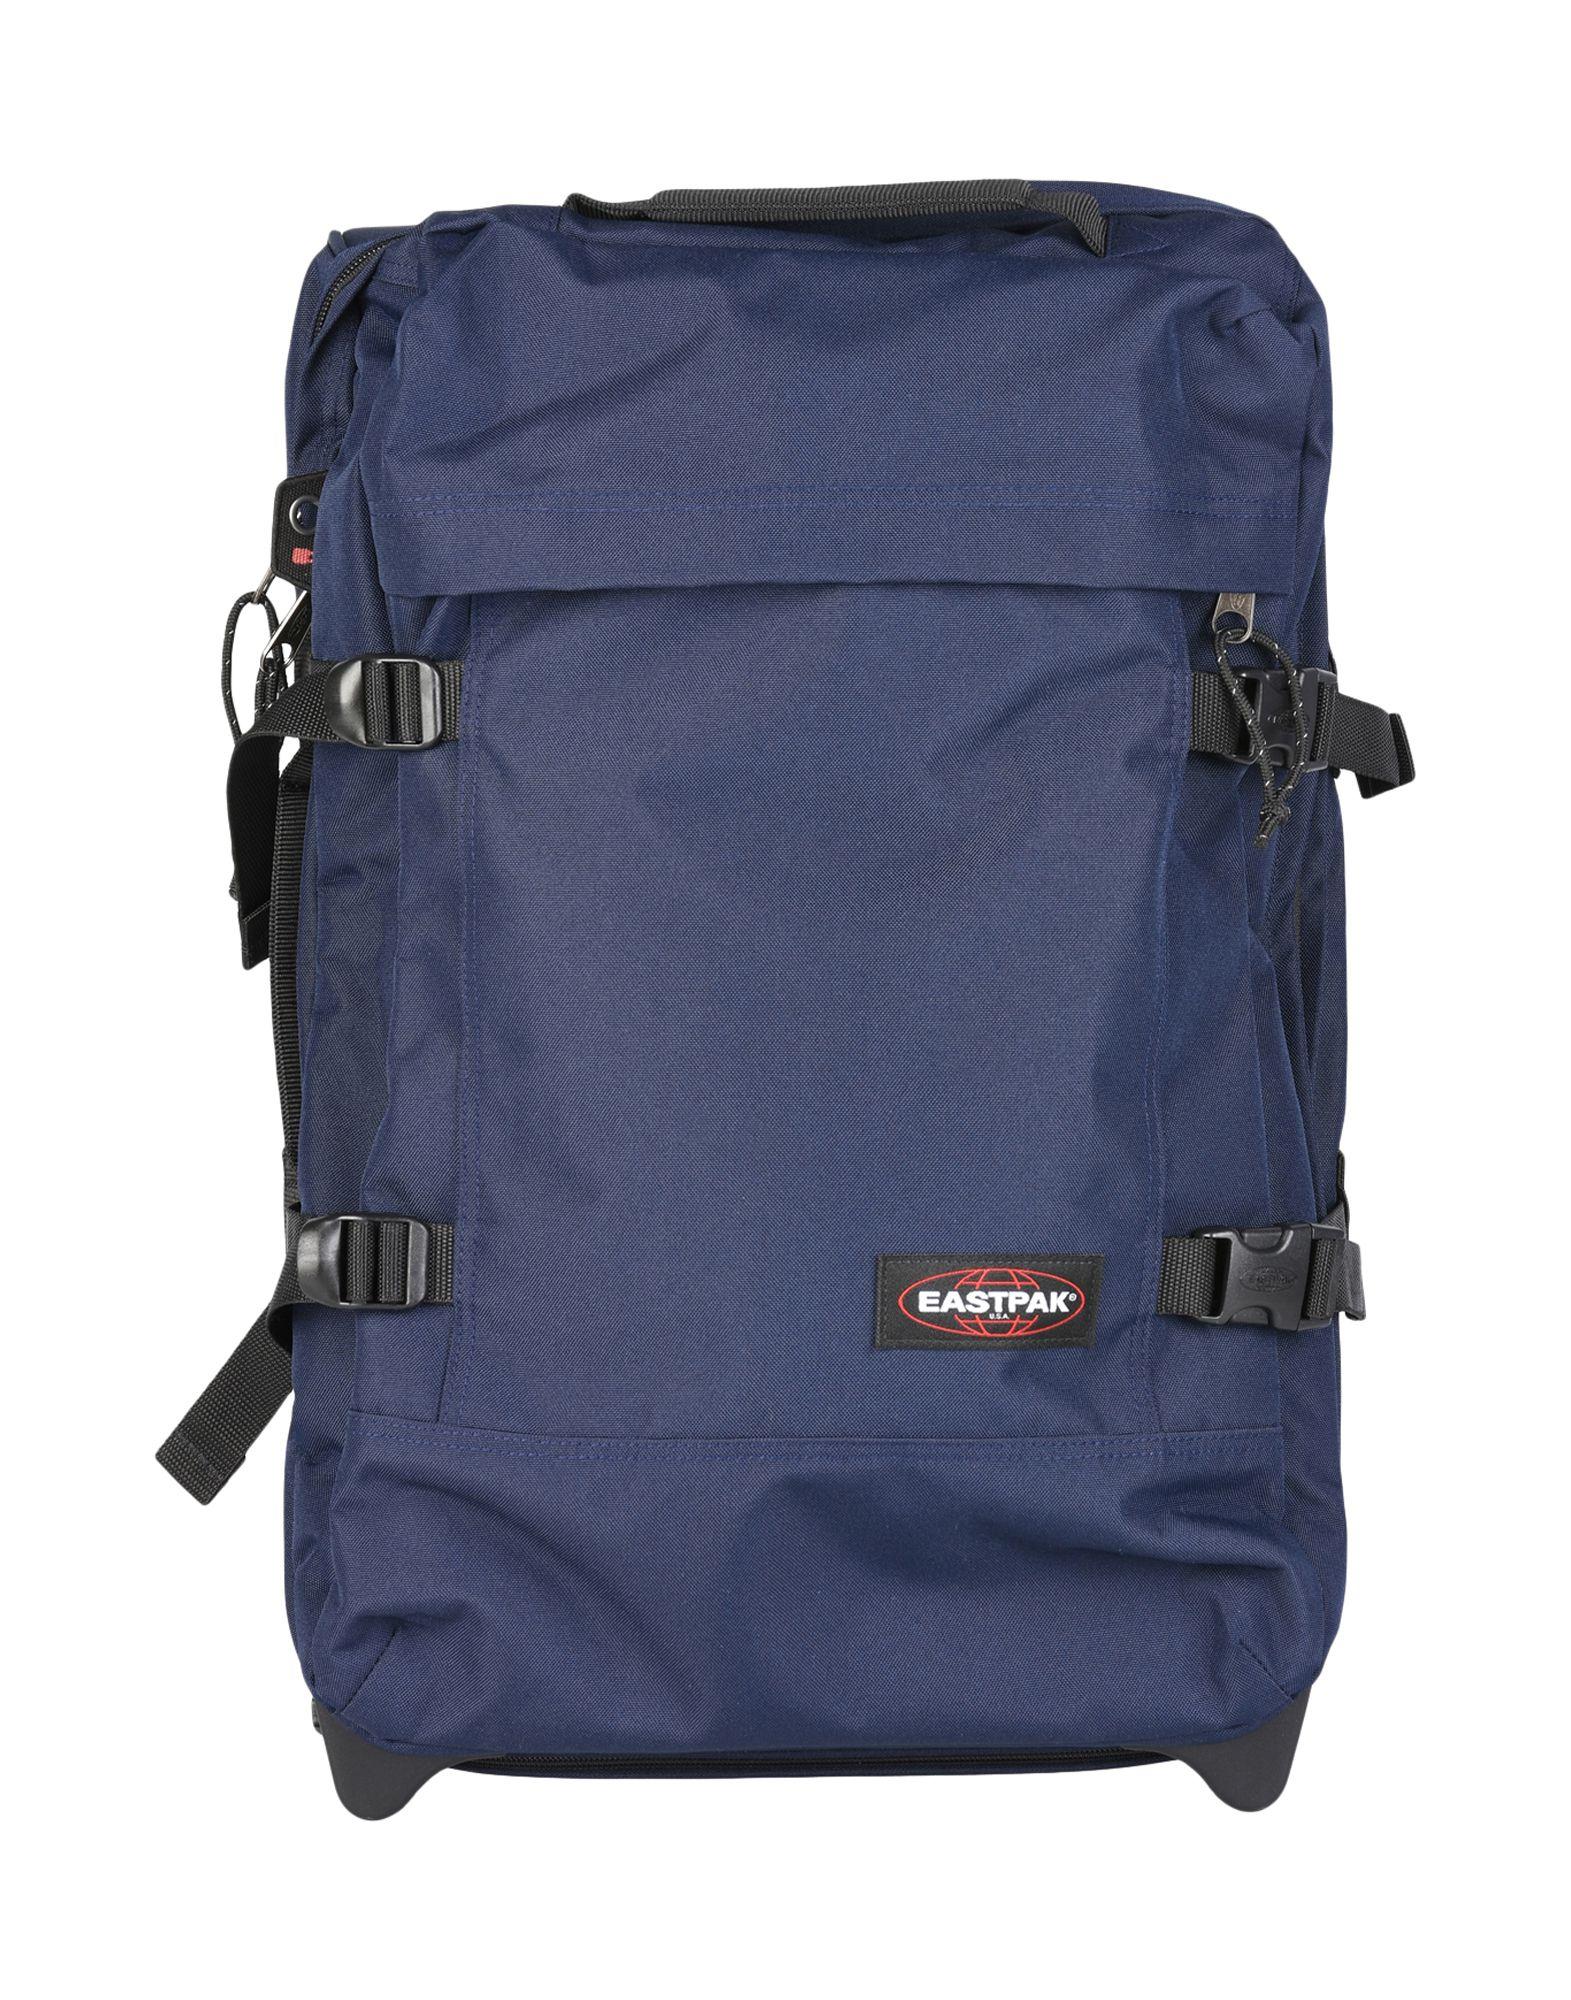 EASTPAK Чемодан/сумка на колесиках kipling чемодан сумка на колесиках